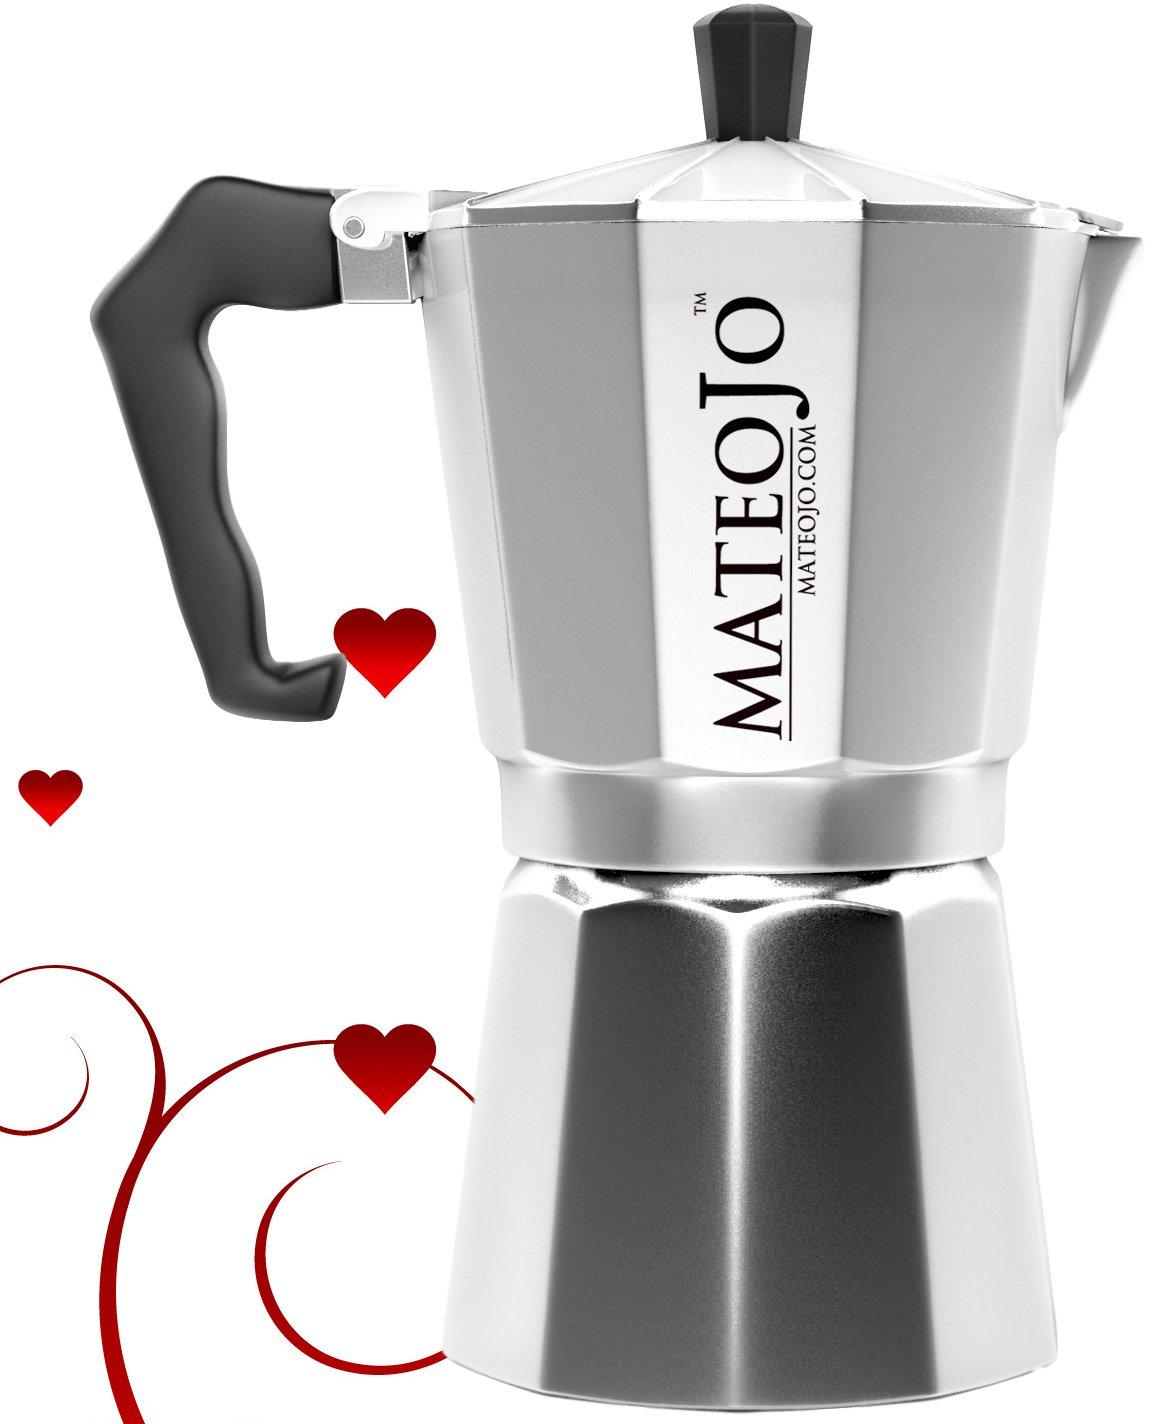 Stovetop Espresso Maker - Italian Moka Pot - Cafetera - Cuban Coffee Machine - 6 Cup by MateoJo … by MateoJo